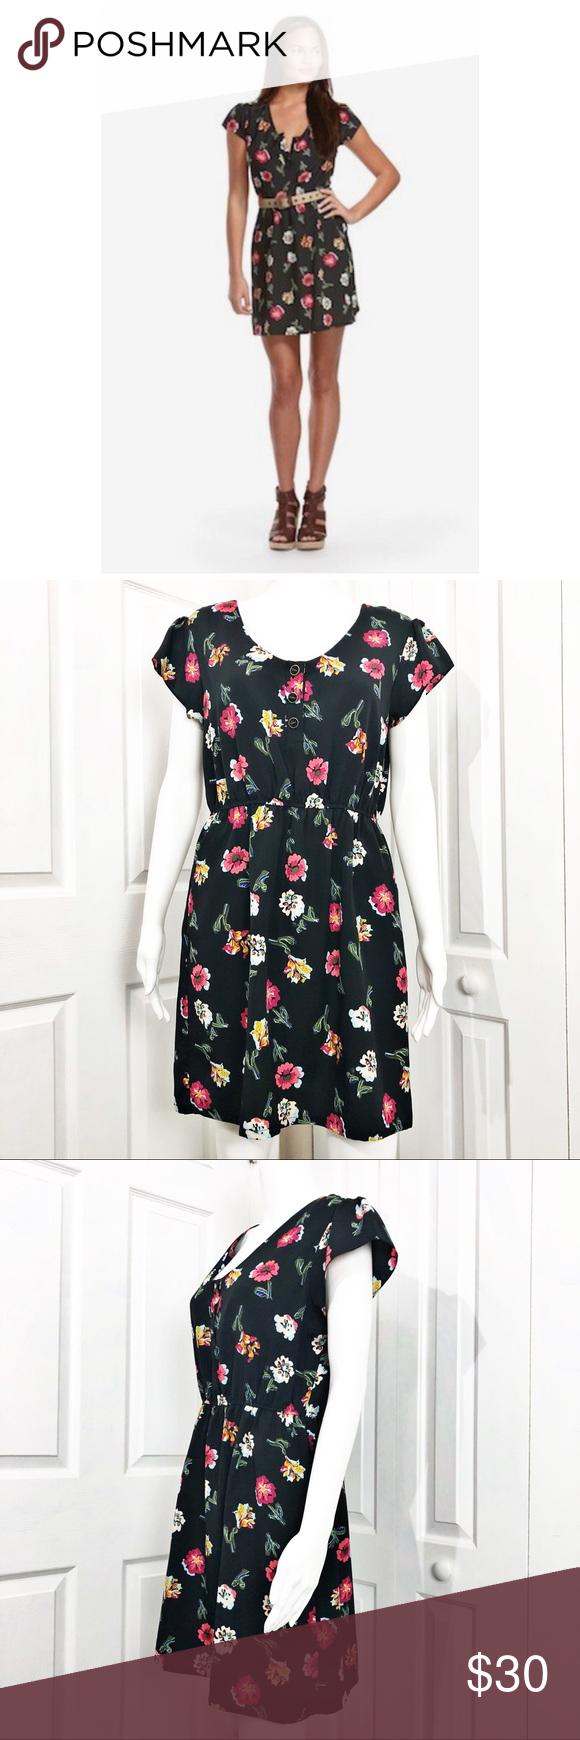 Tucker For Target Floral Dress Clothes Design Floral Dress Fashion [ 1740 x 580 Pixel ]